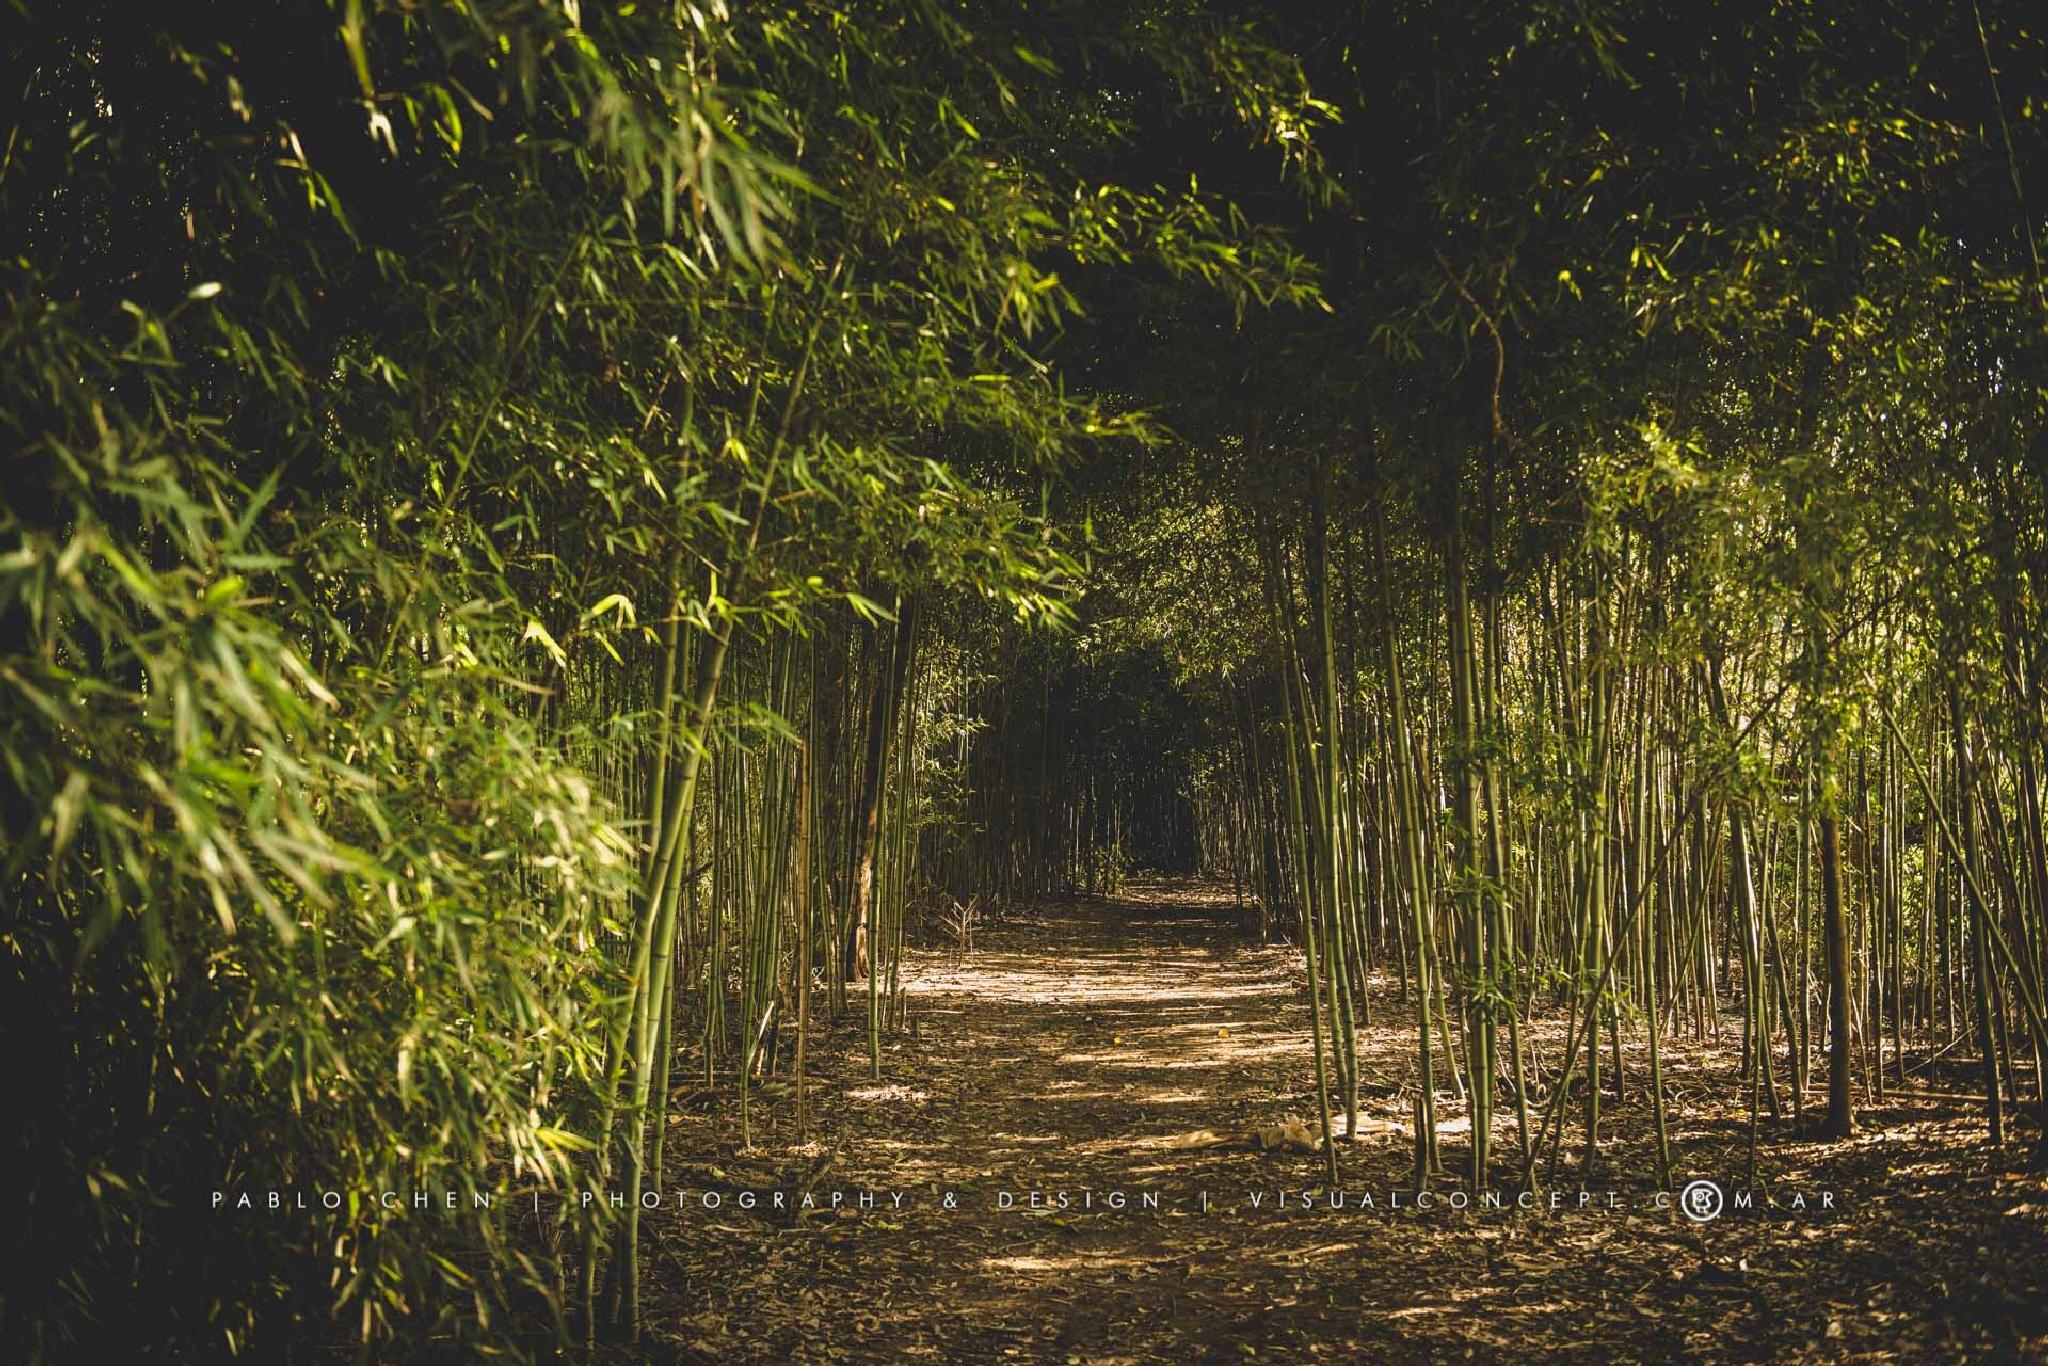 Delta Terra Natural Reserve by Pablo Chen